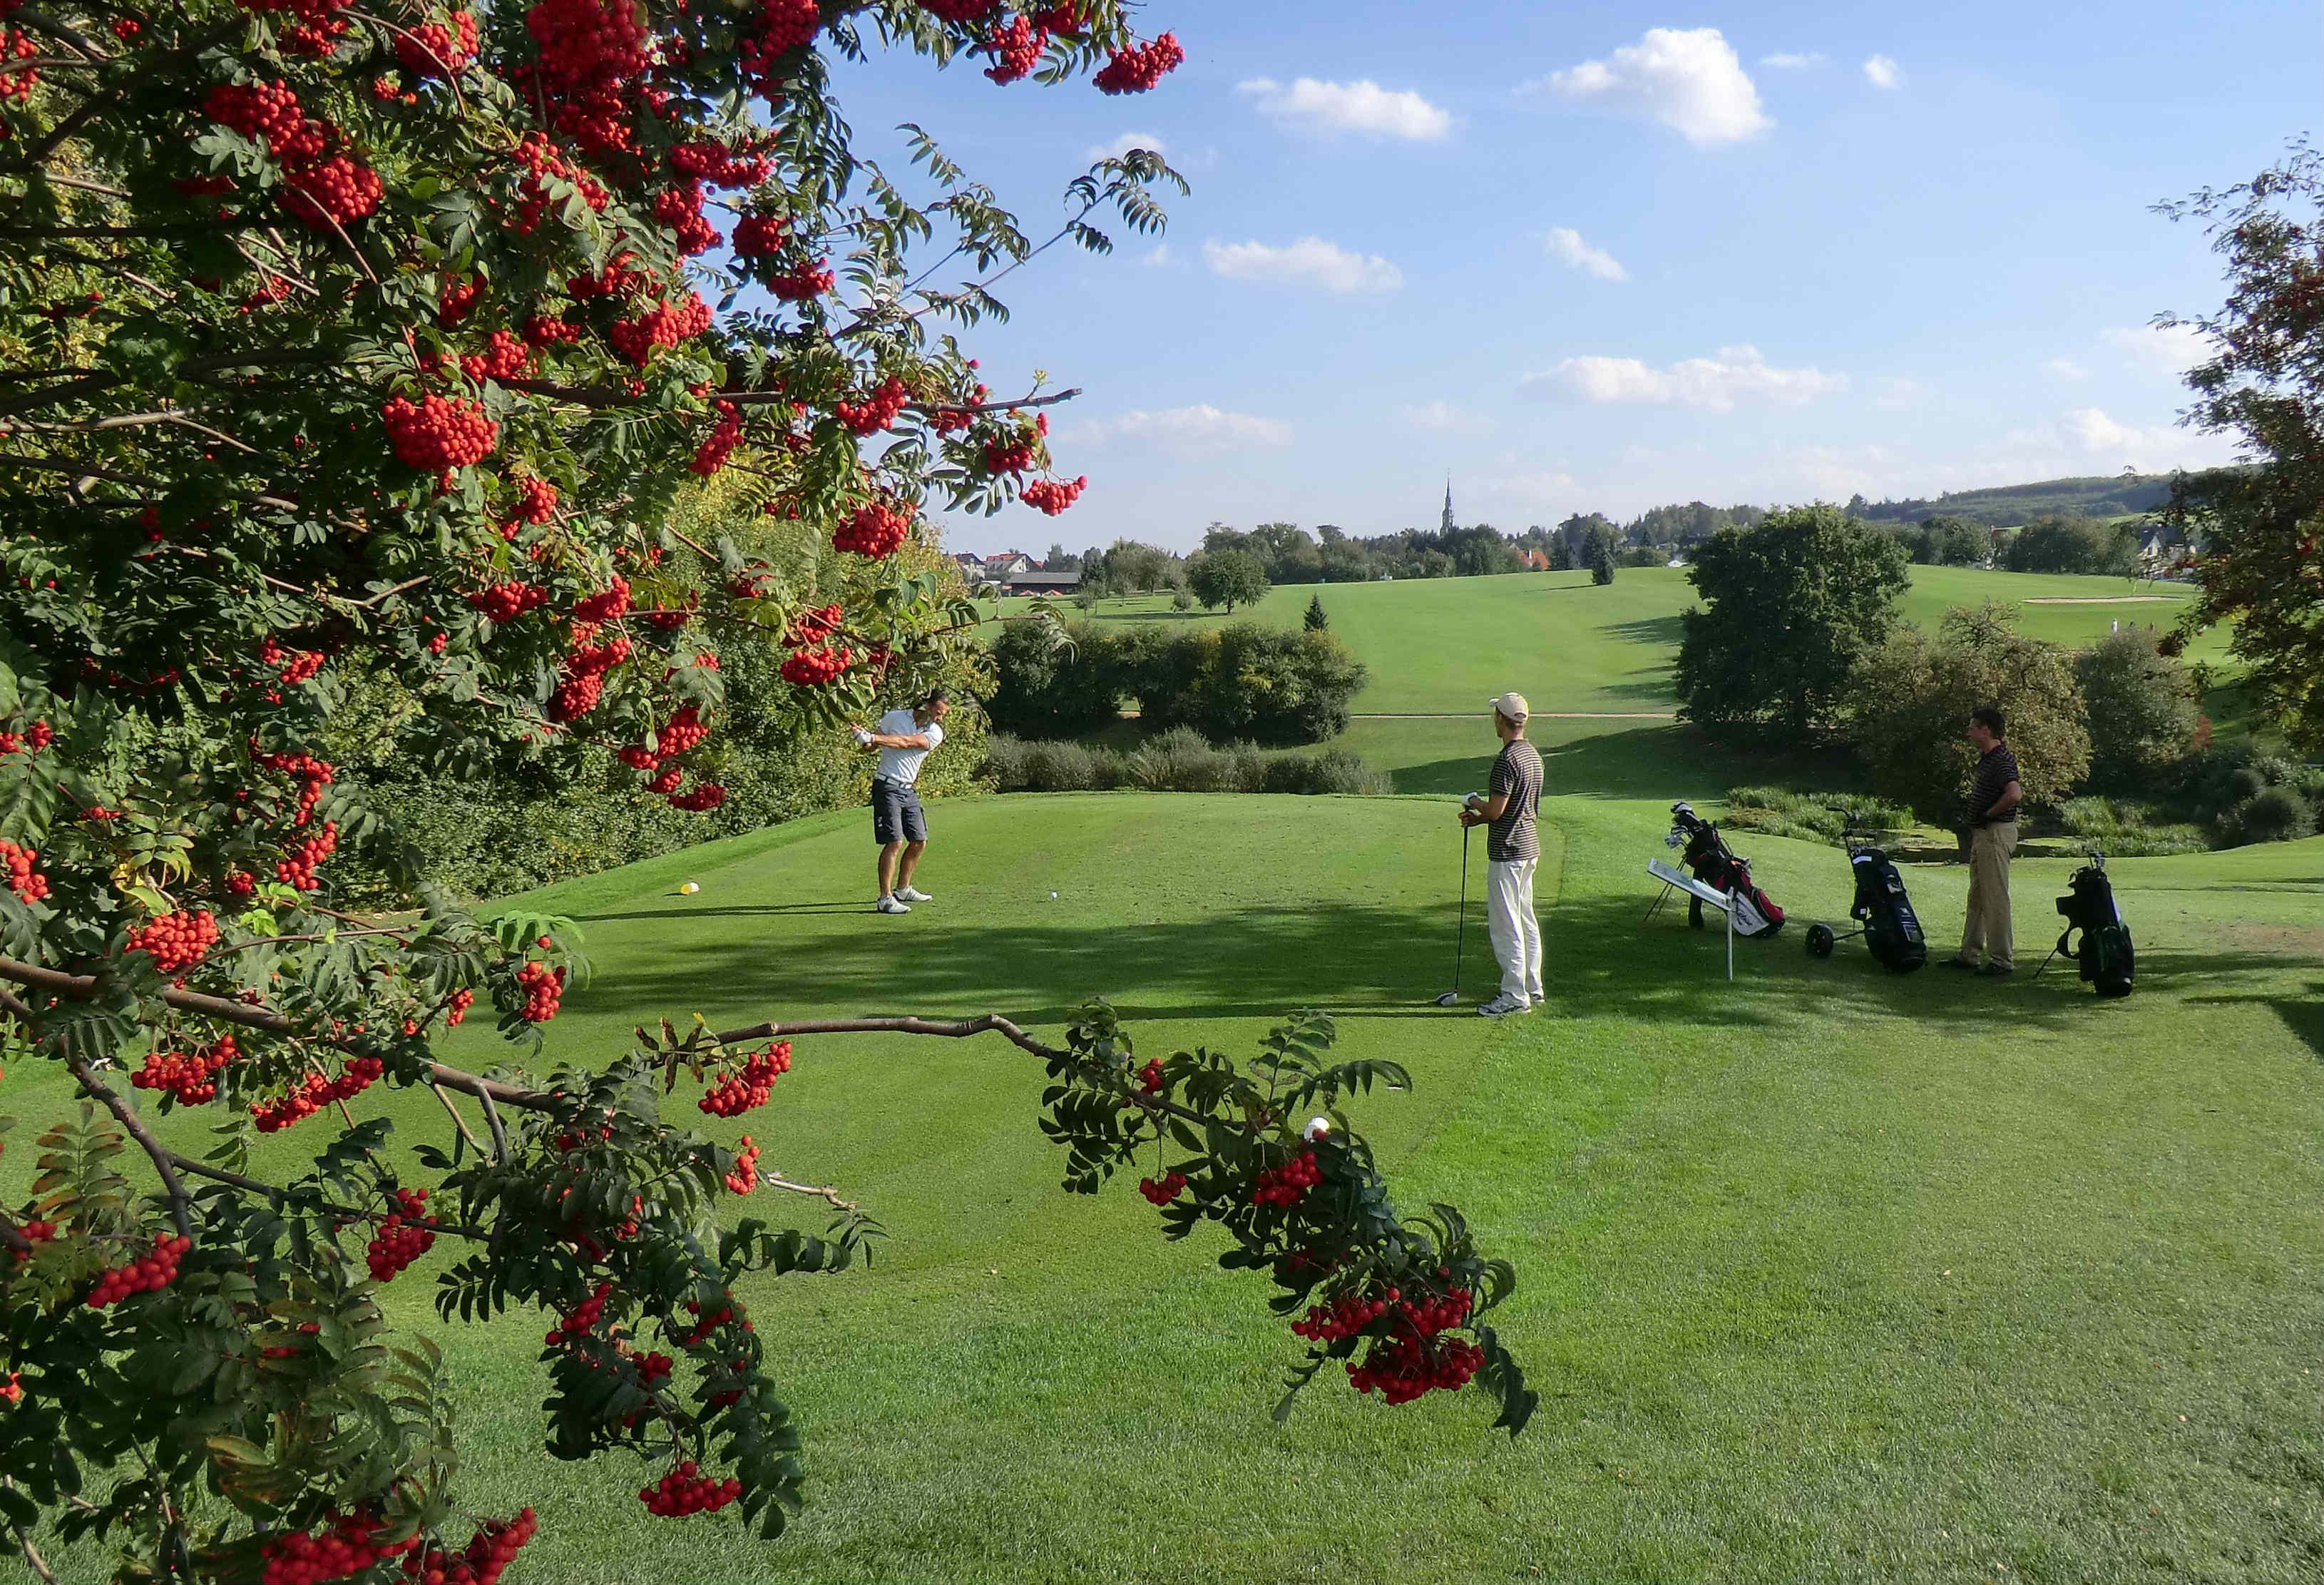 Foto: Golfpark Dresden Elbflorenz